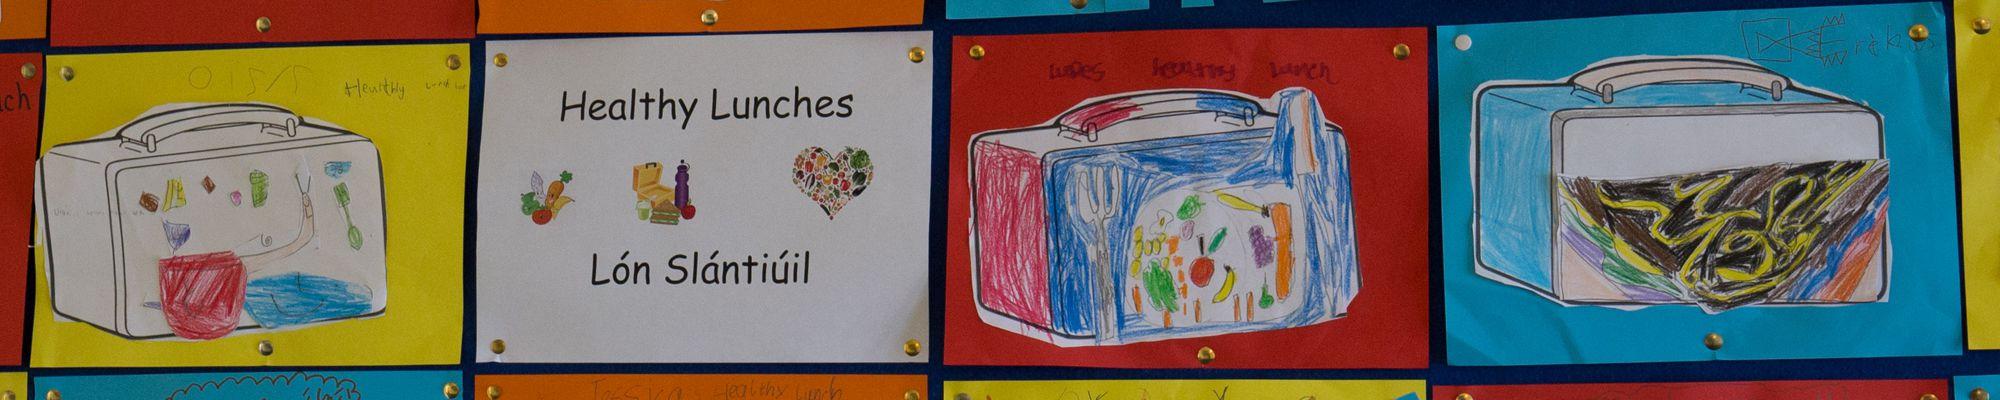 Howth Primary School, Scoil Mhuire